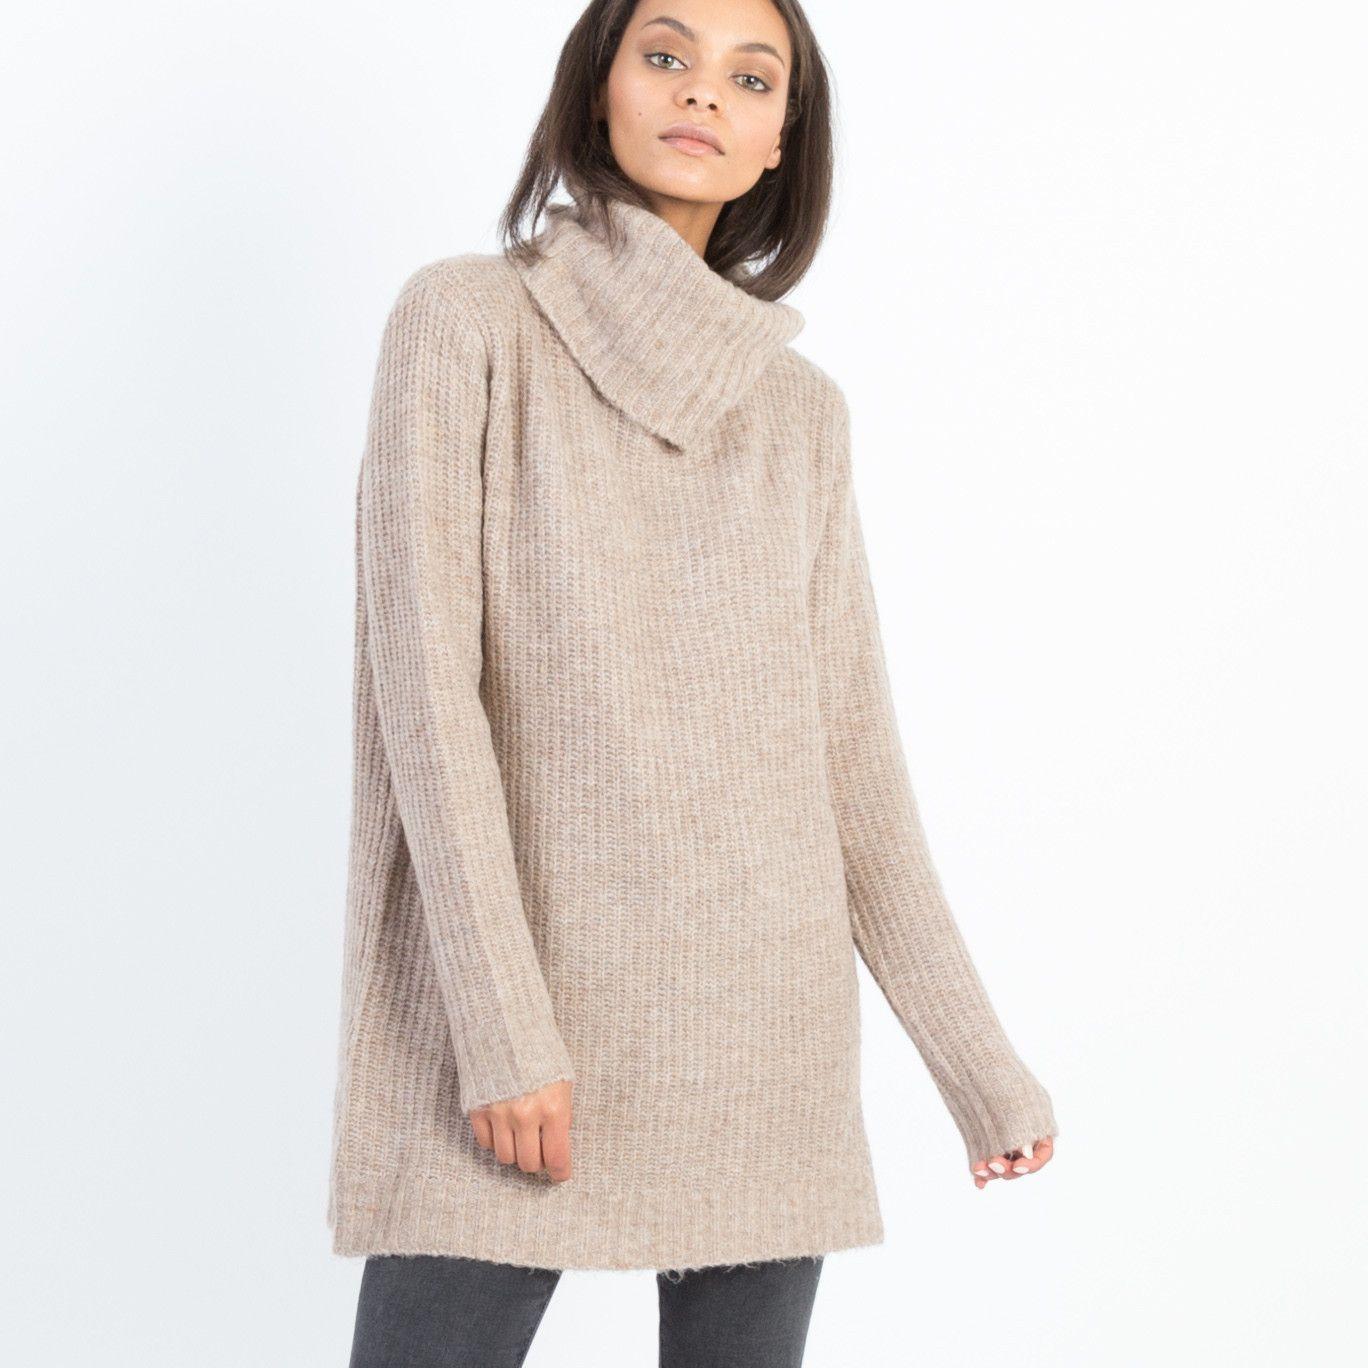 Noa Turtleneck Tunic Sweater (Camel) | Products | Pinterest ...